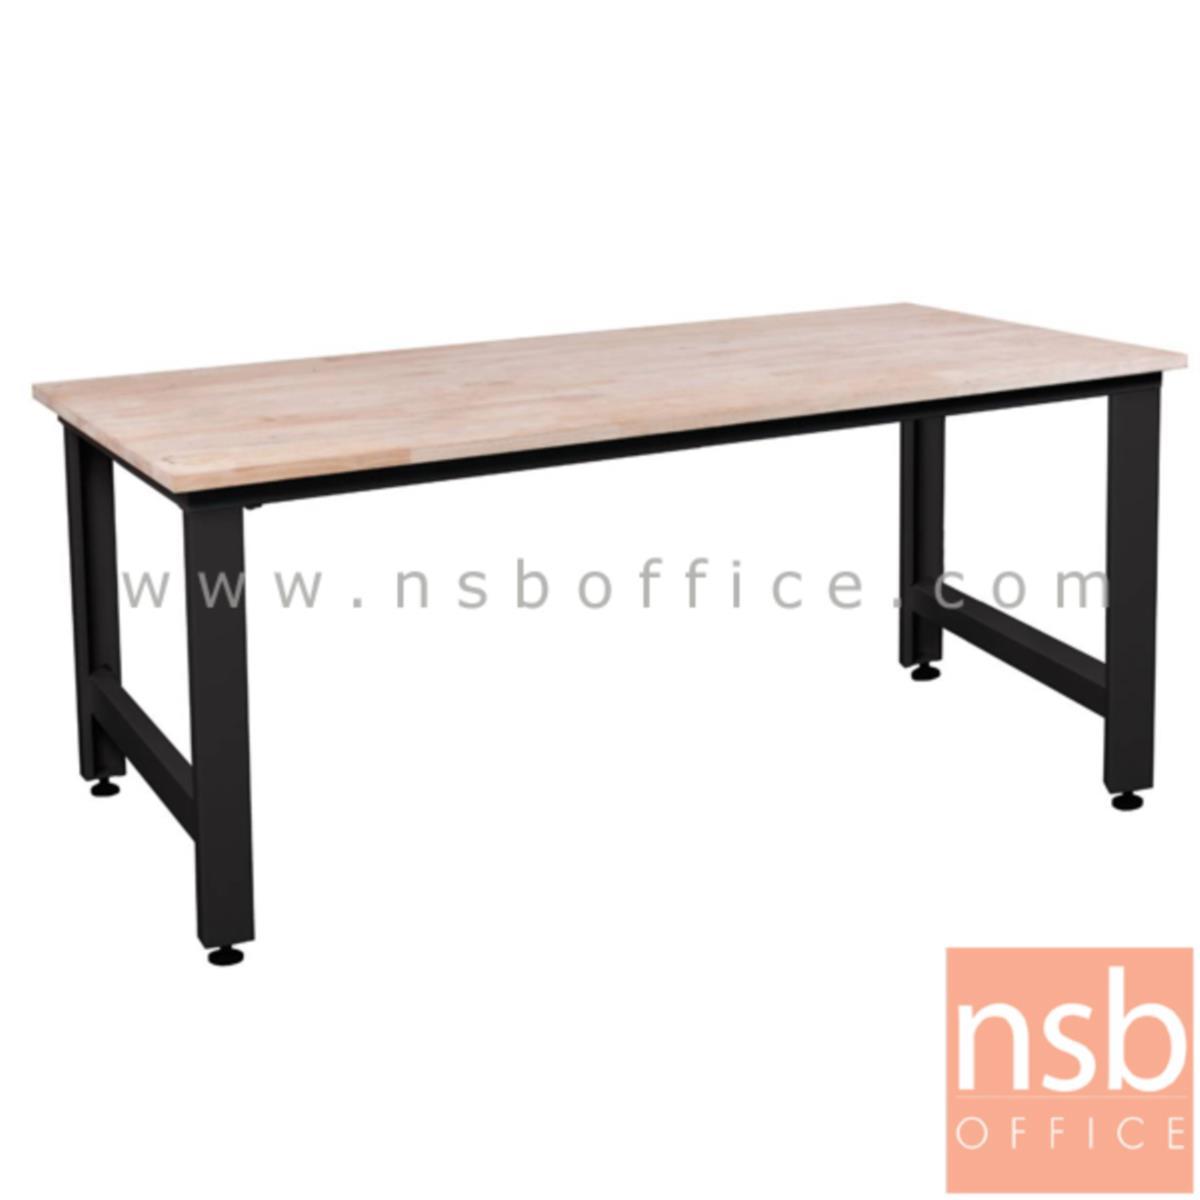 E08A073:โต๊ะช่าง TOP ไม้ ขาเหล็ก รุ่น MTD60